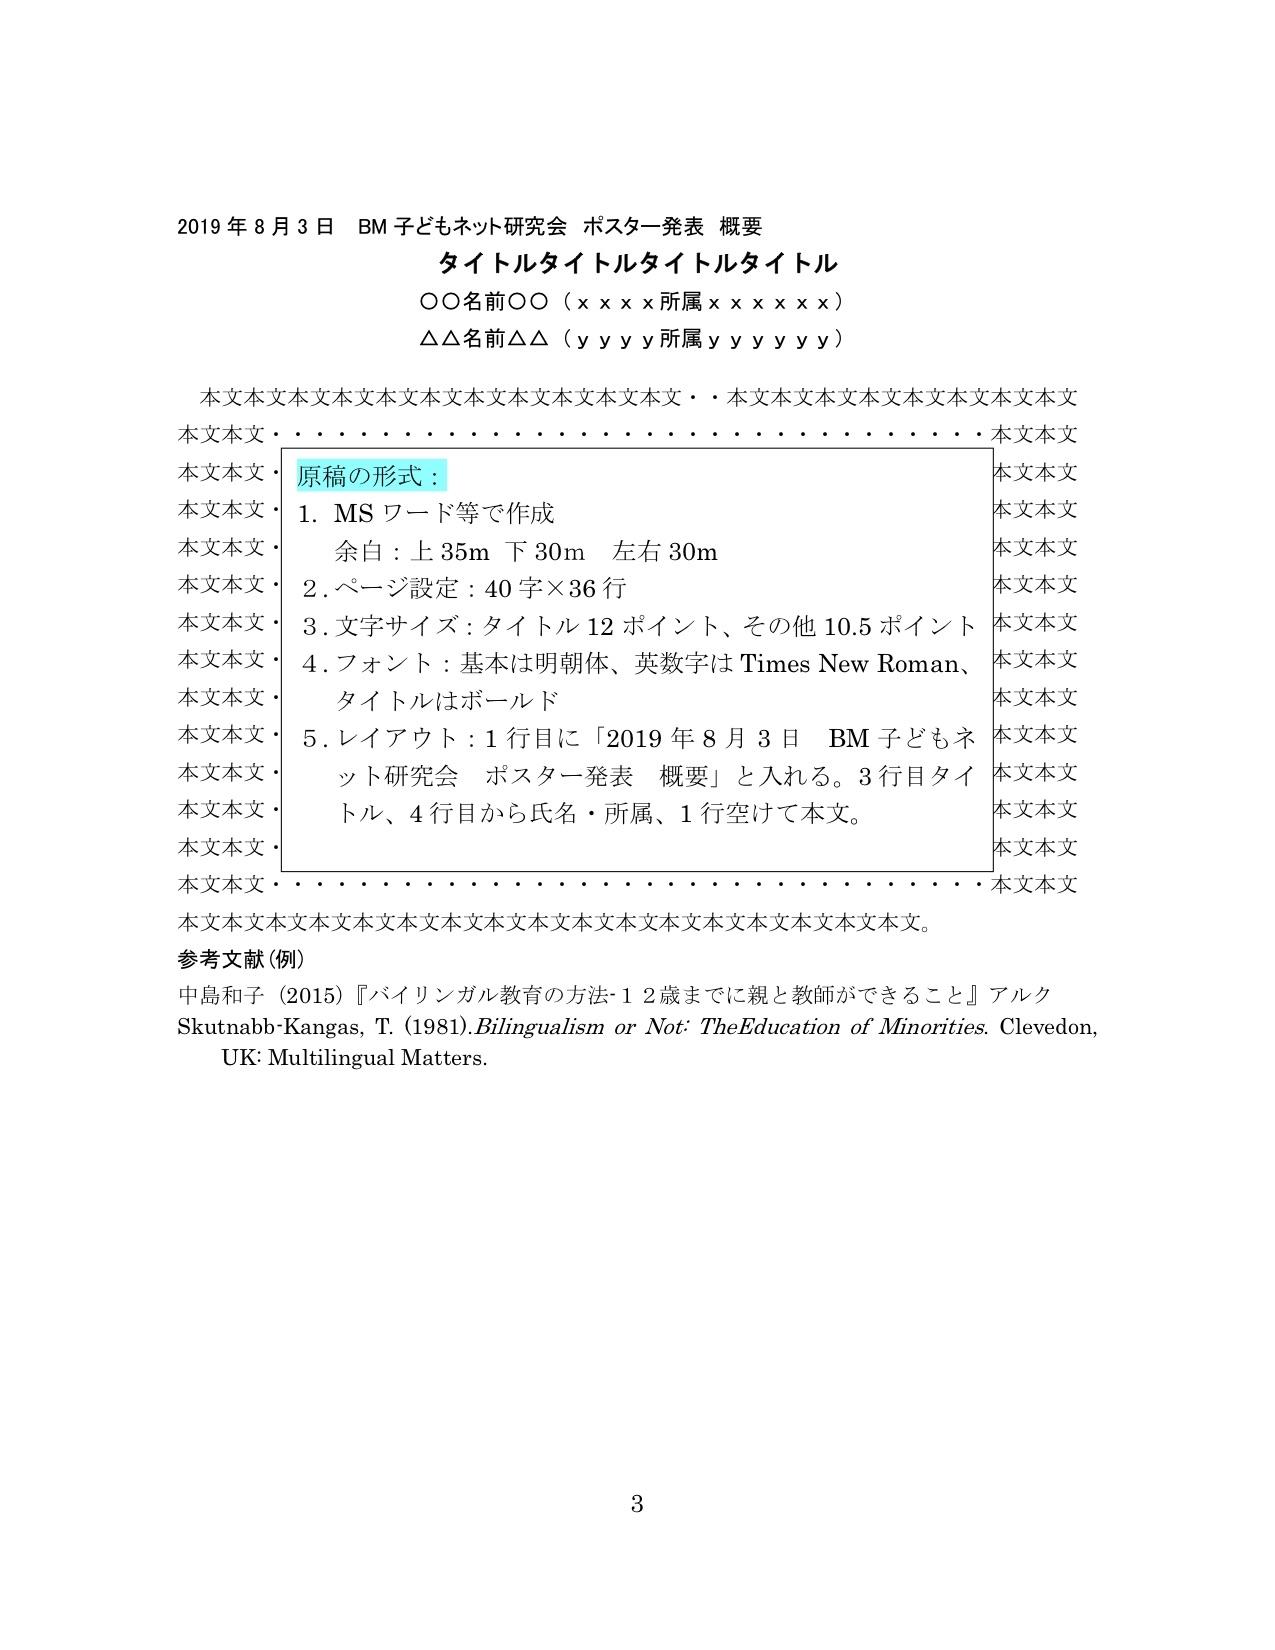 BMCN20190803_DeskPosterAppGuid(ドラッグされました) 2.jpg